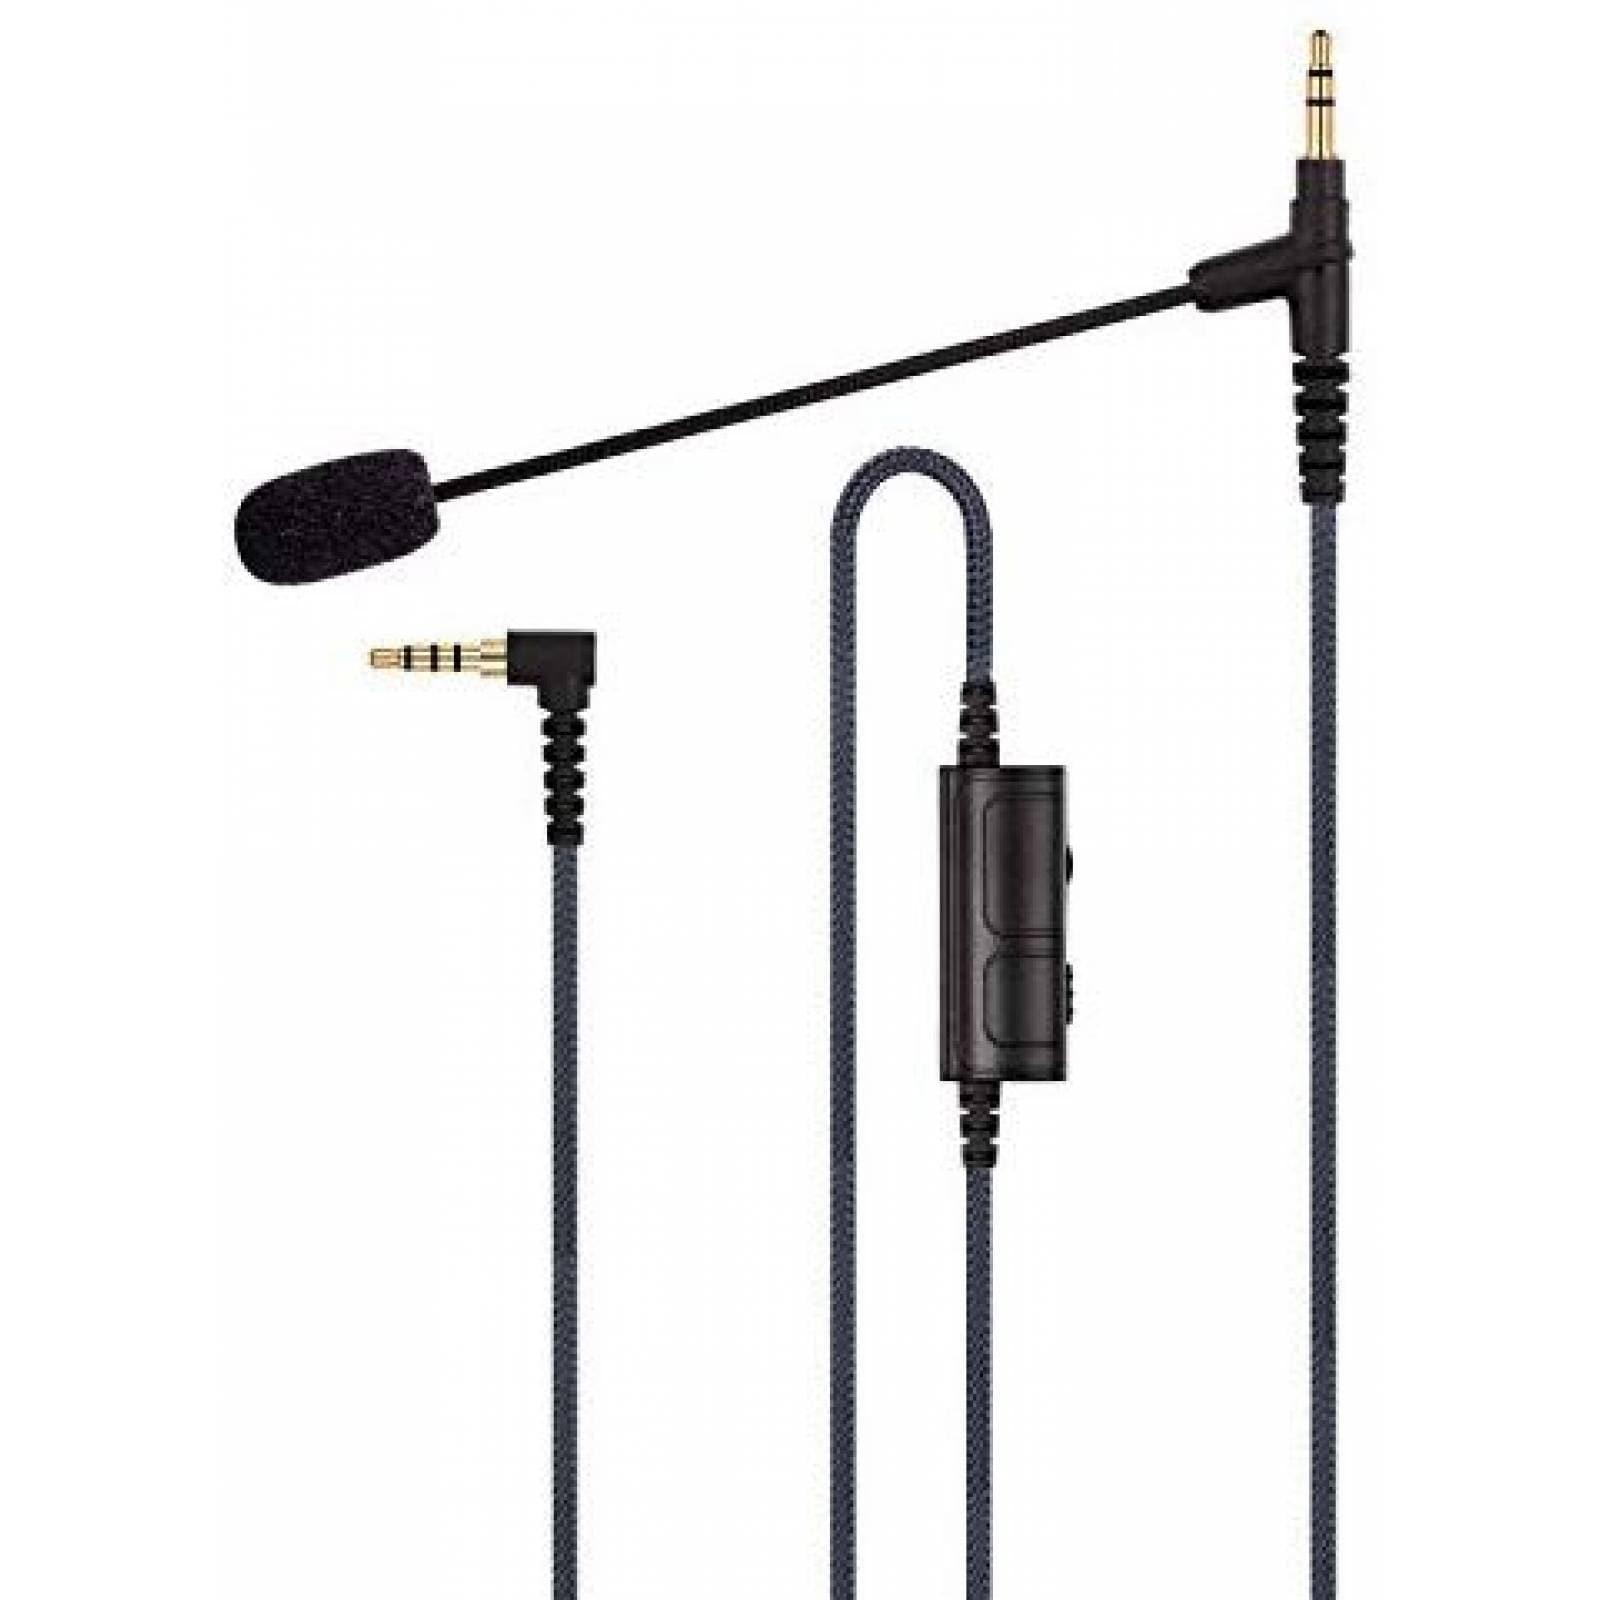 Micrófono gamer ABLET Boompro 150cm control vol jack 3.5mm